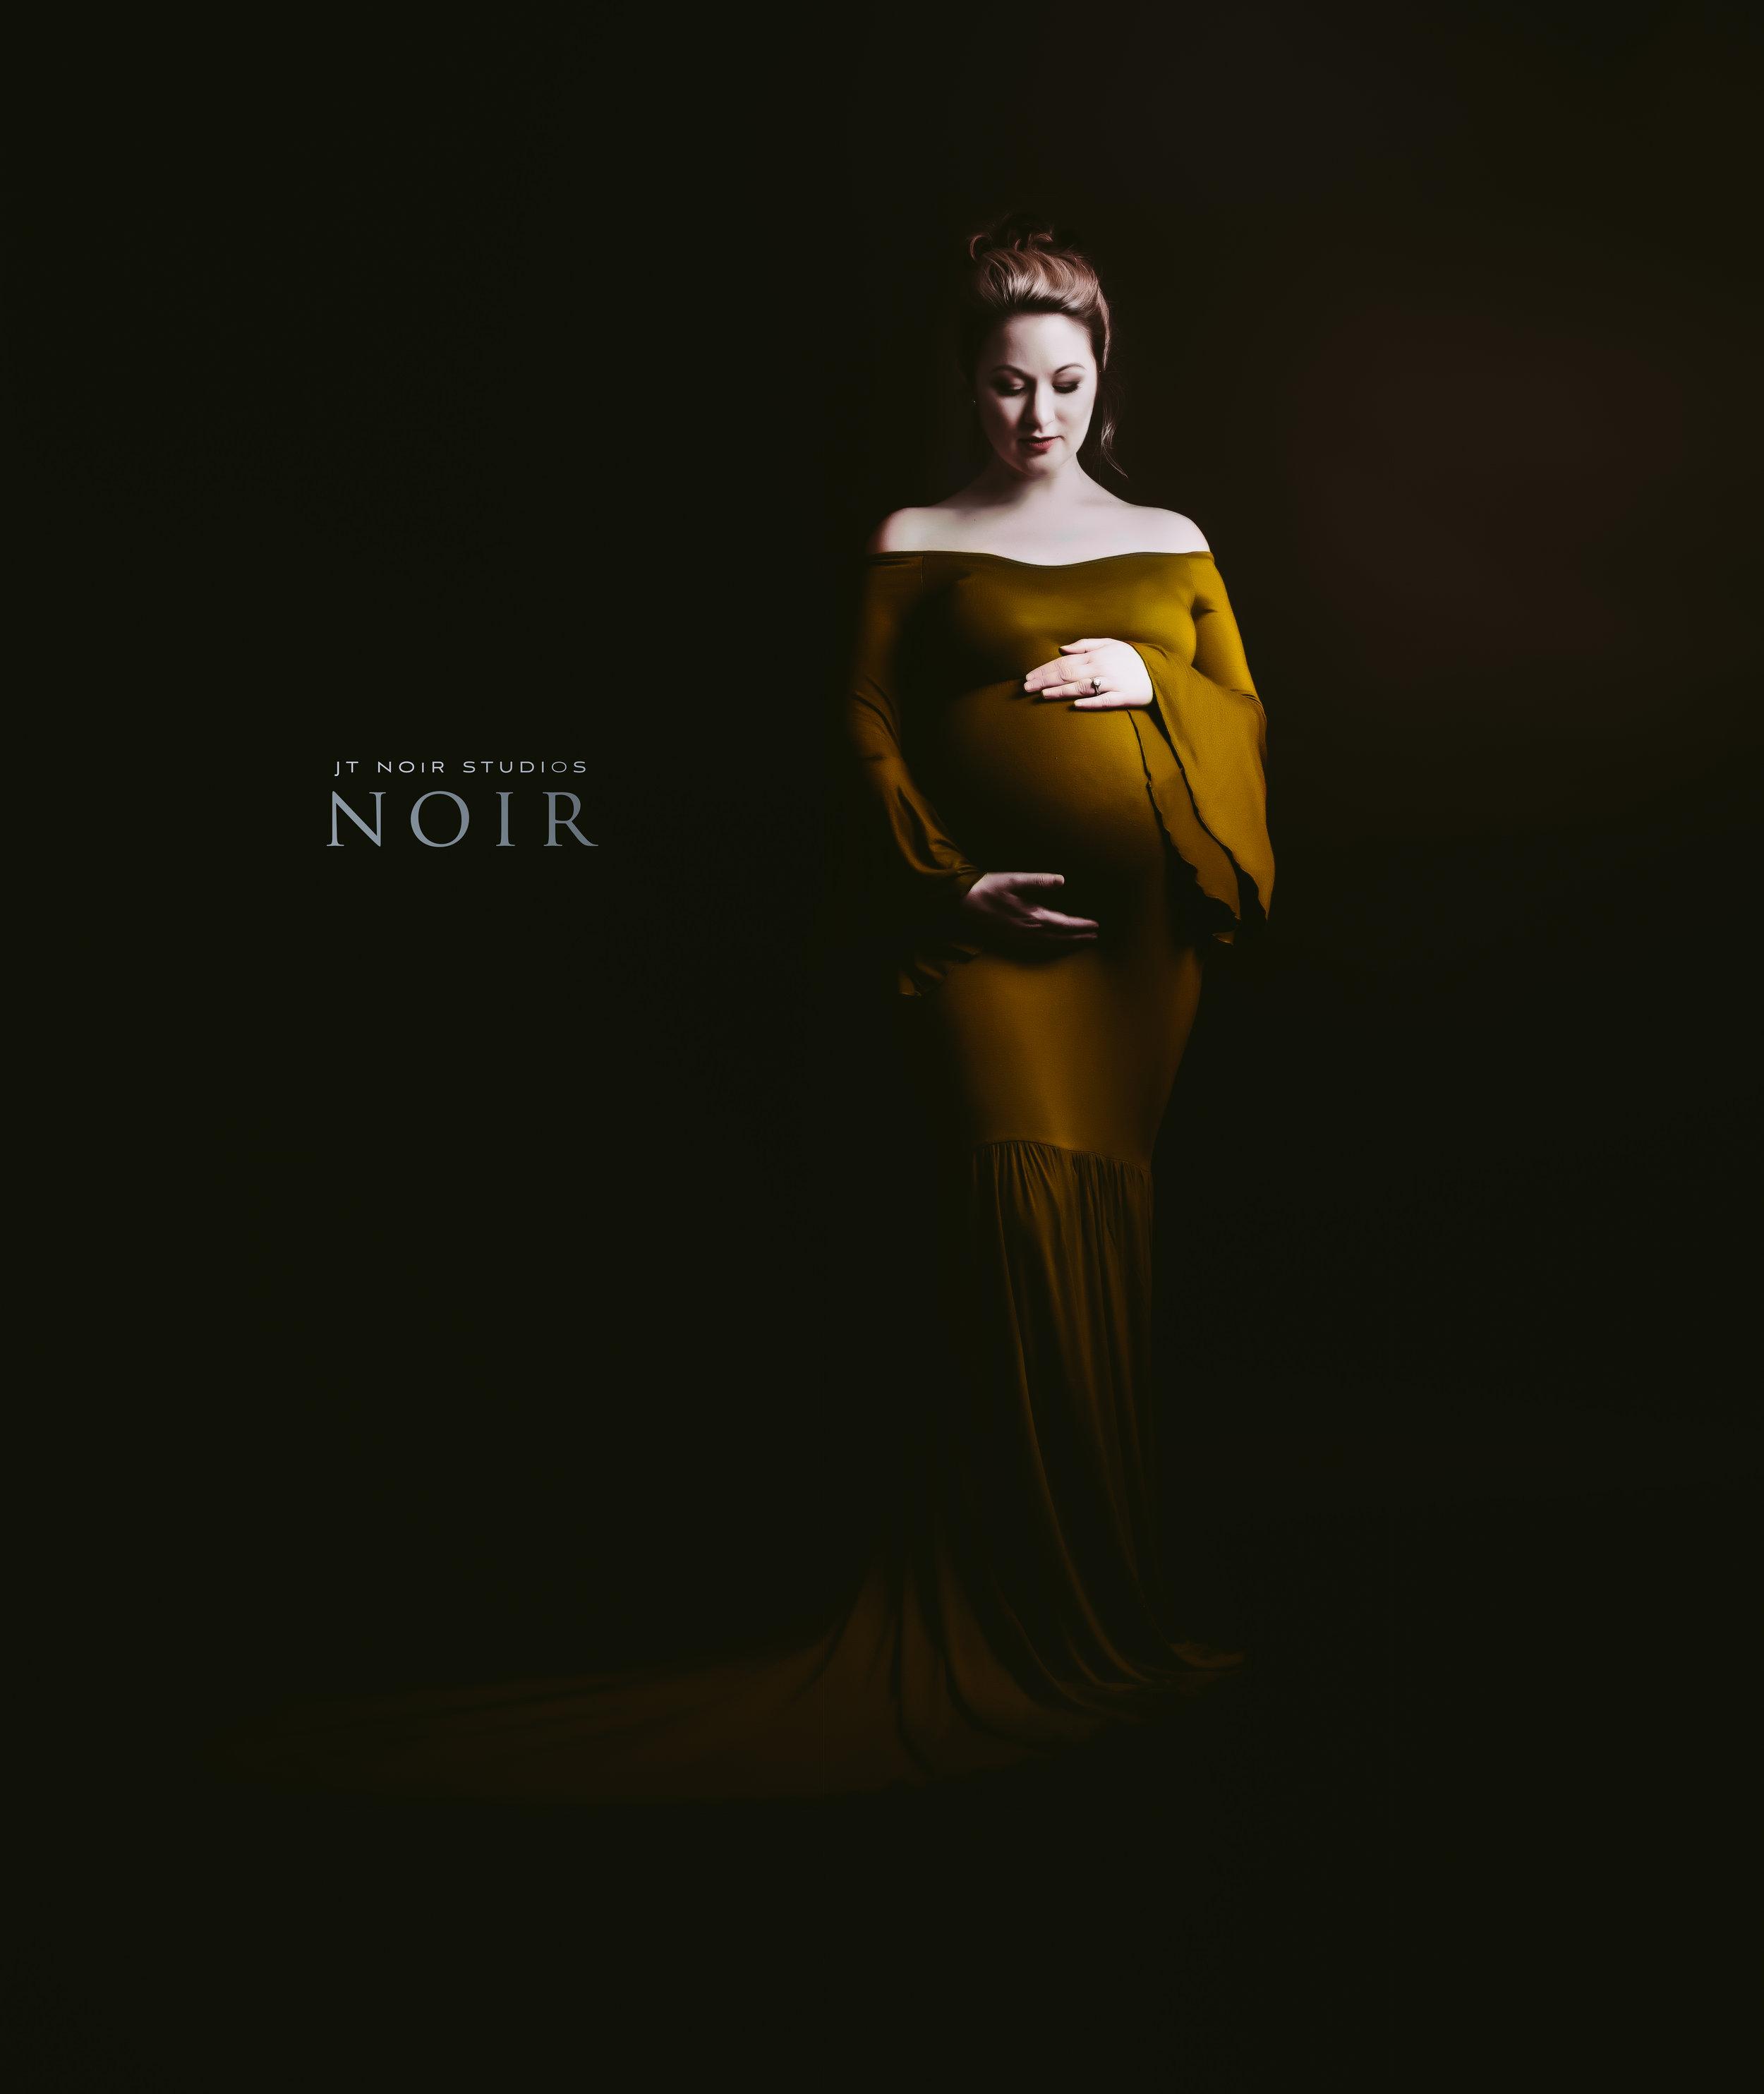 JTNoirStudios_LaurenBarnes_Maternity -2.jpg